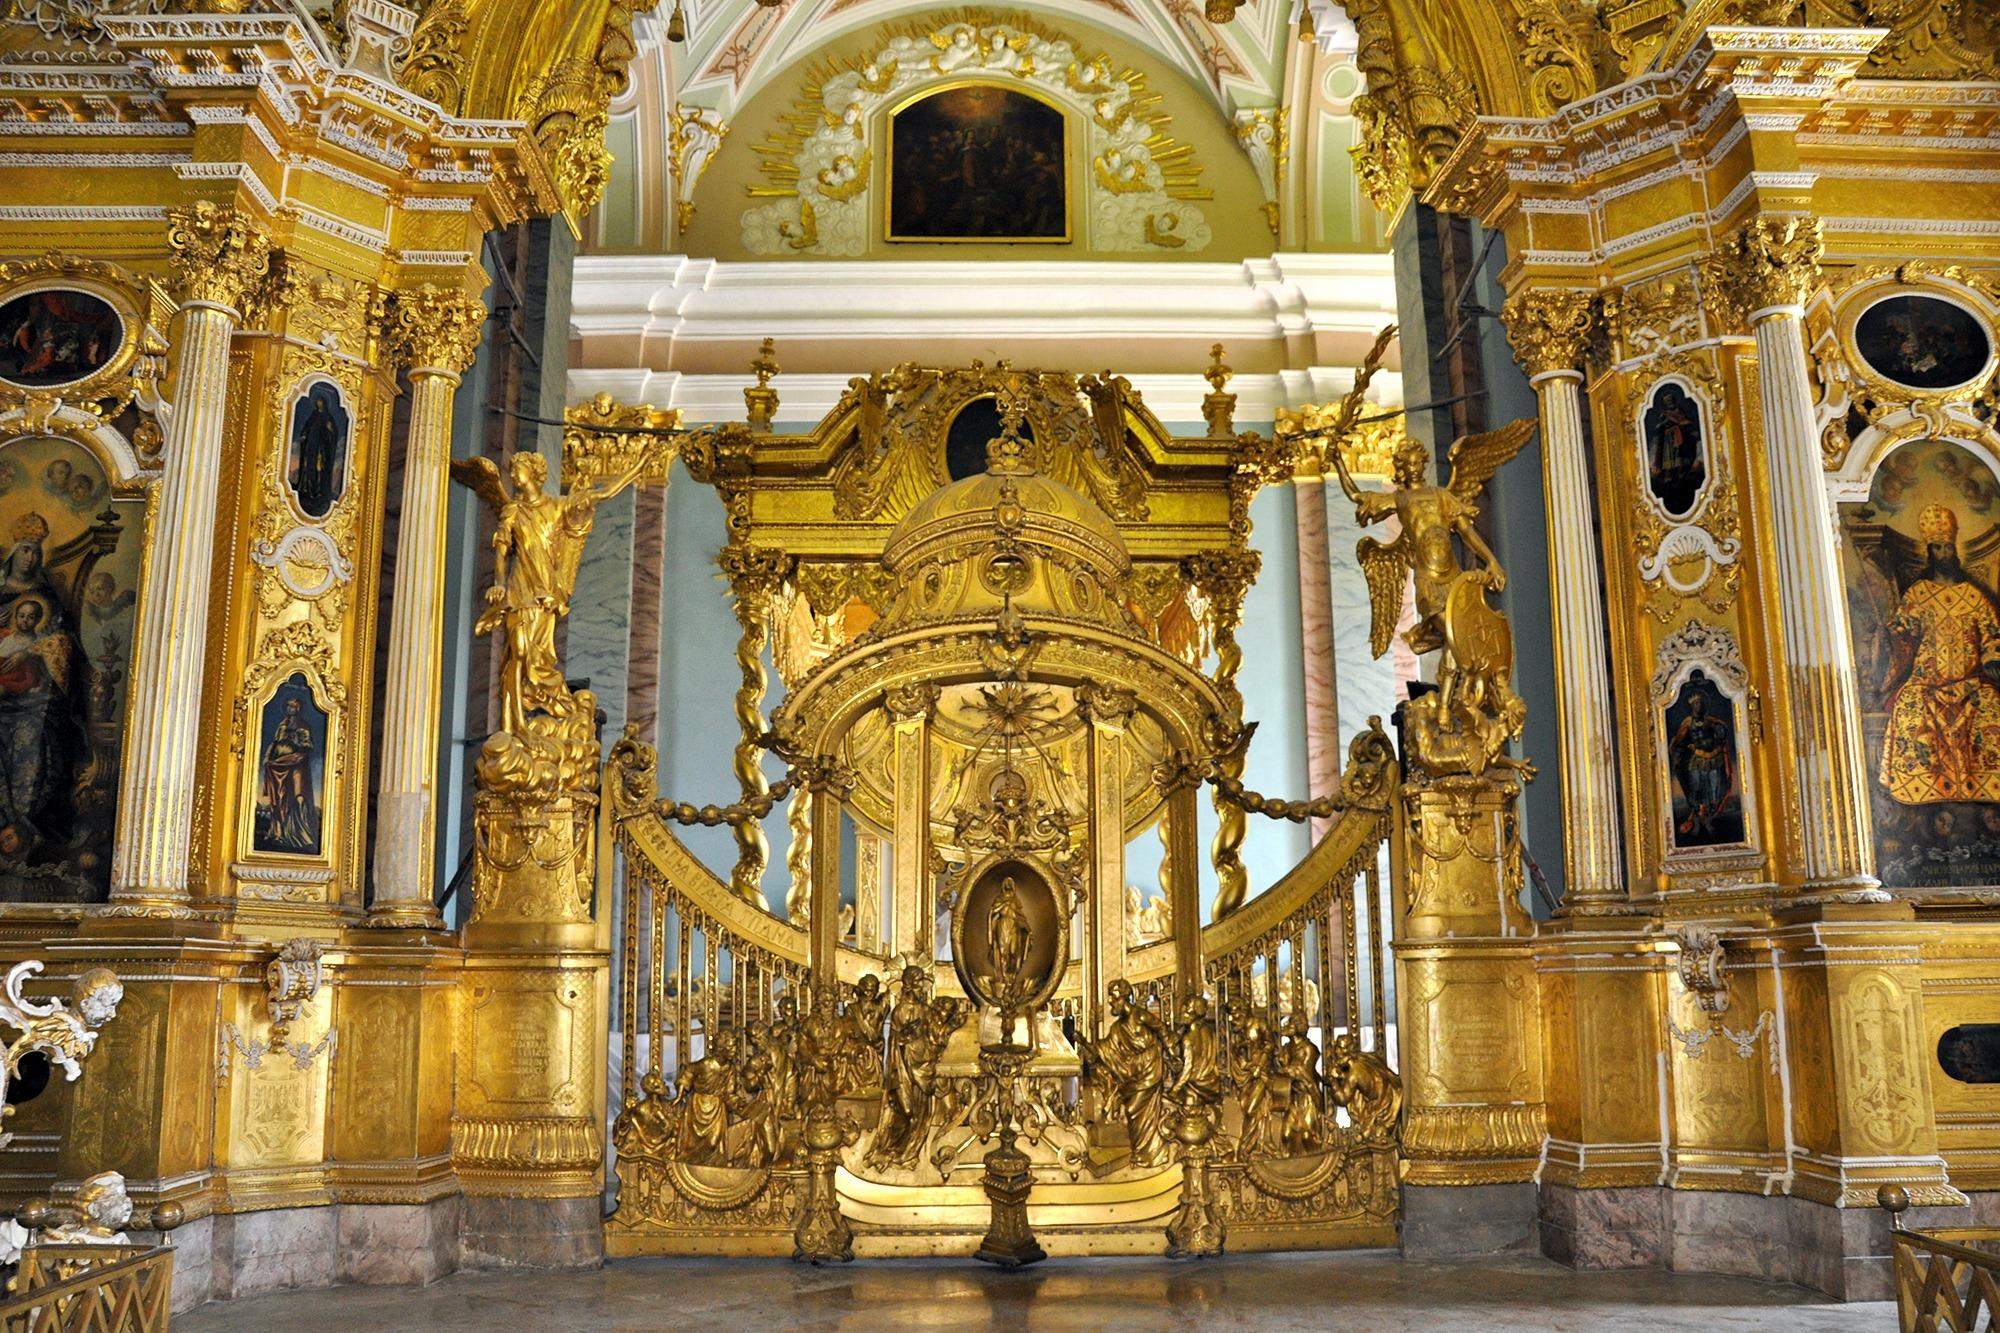 Царские врата иконостаса Петропавловского собора